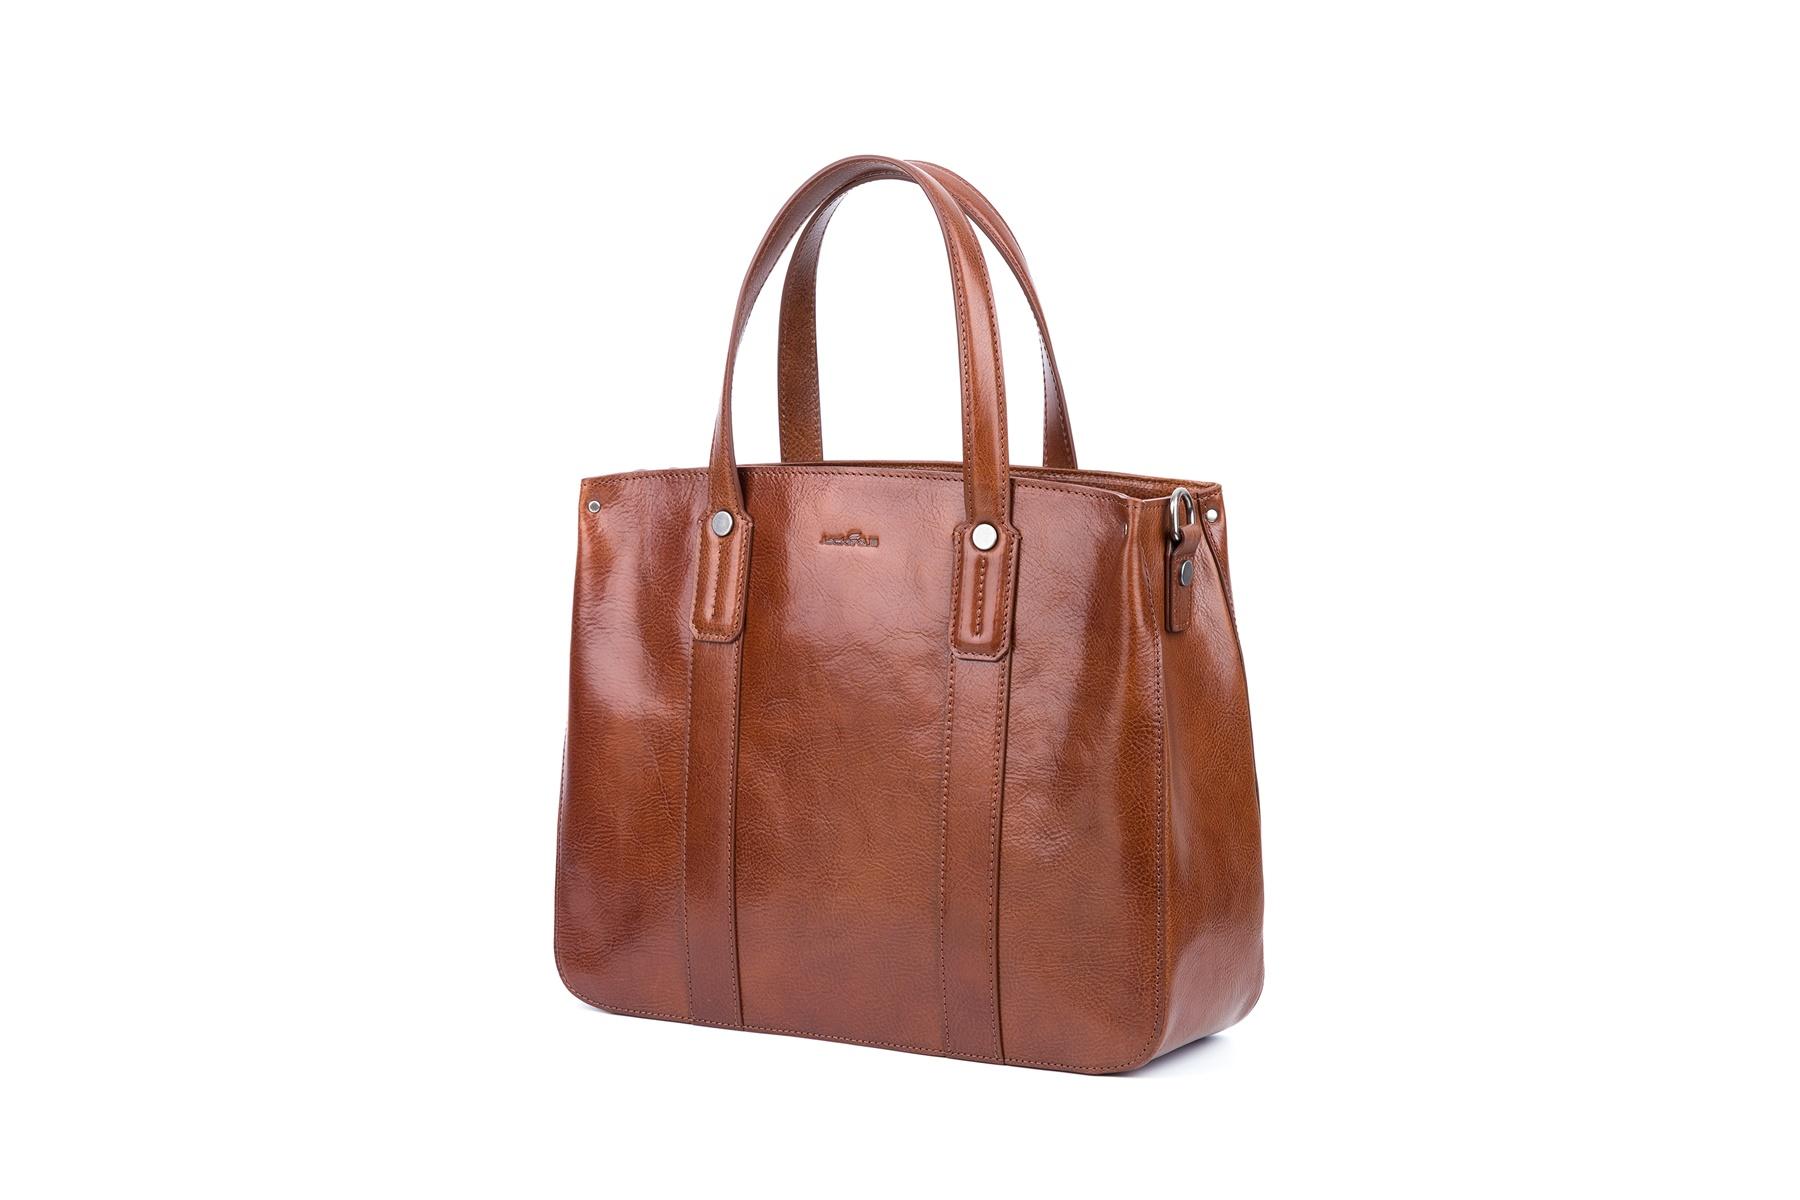 GF bags-Latest Handbags | Handbag Top Handle Waxed Leather Zipper Close Bag - Gaofeng-5